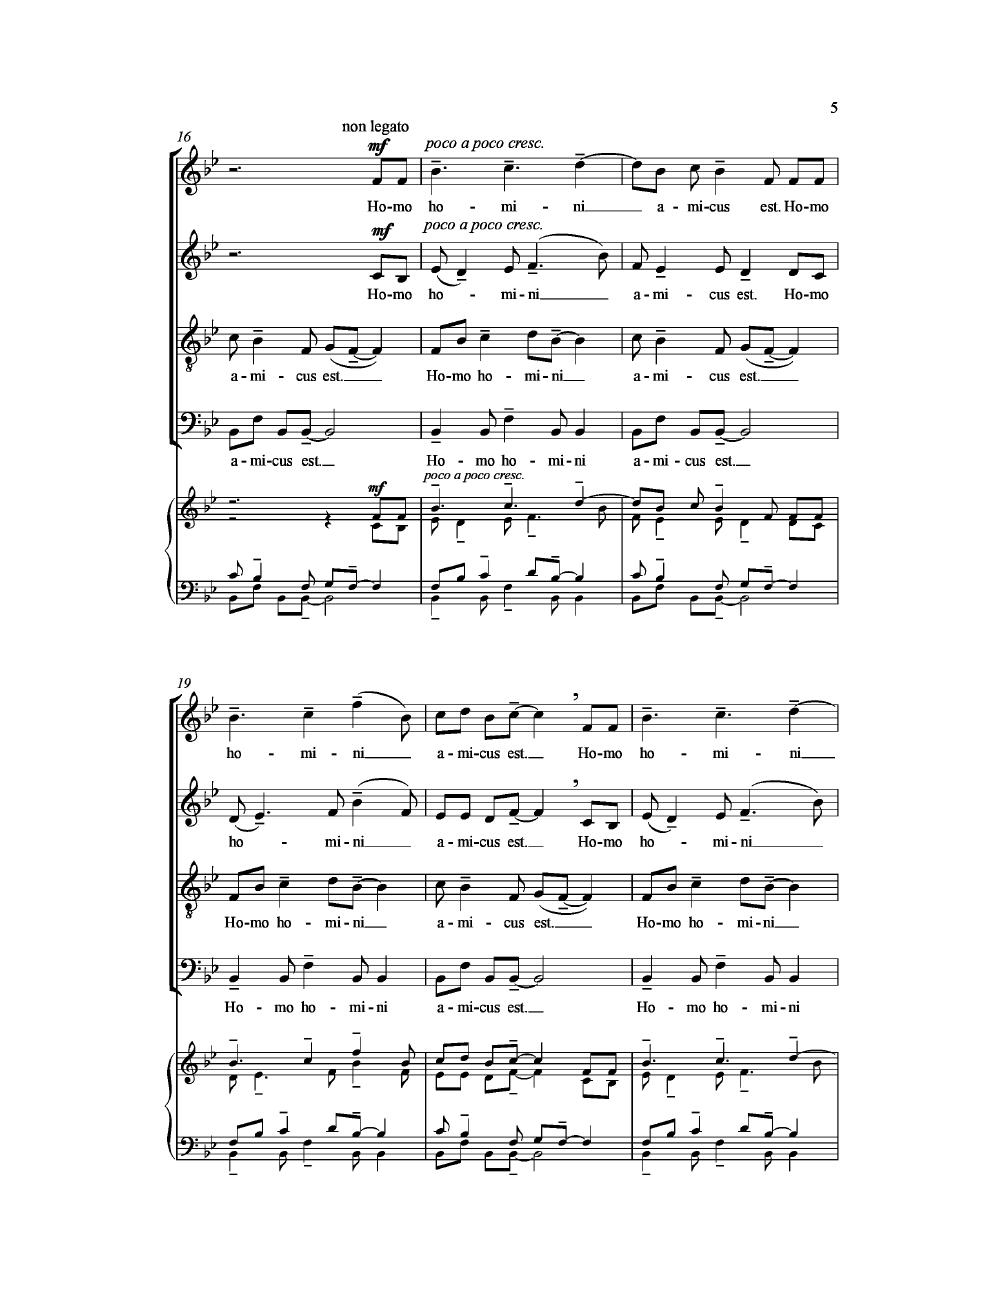 Vox Populi Ssatbb By Giedrius Svilainis J W Pepper Sheet Music